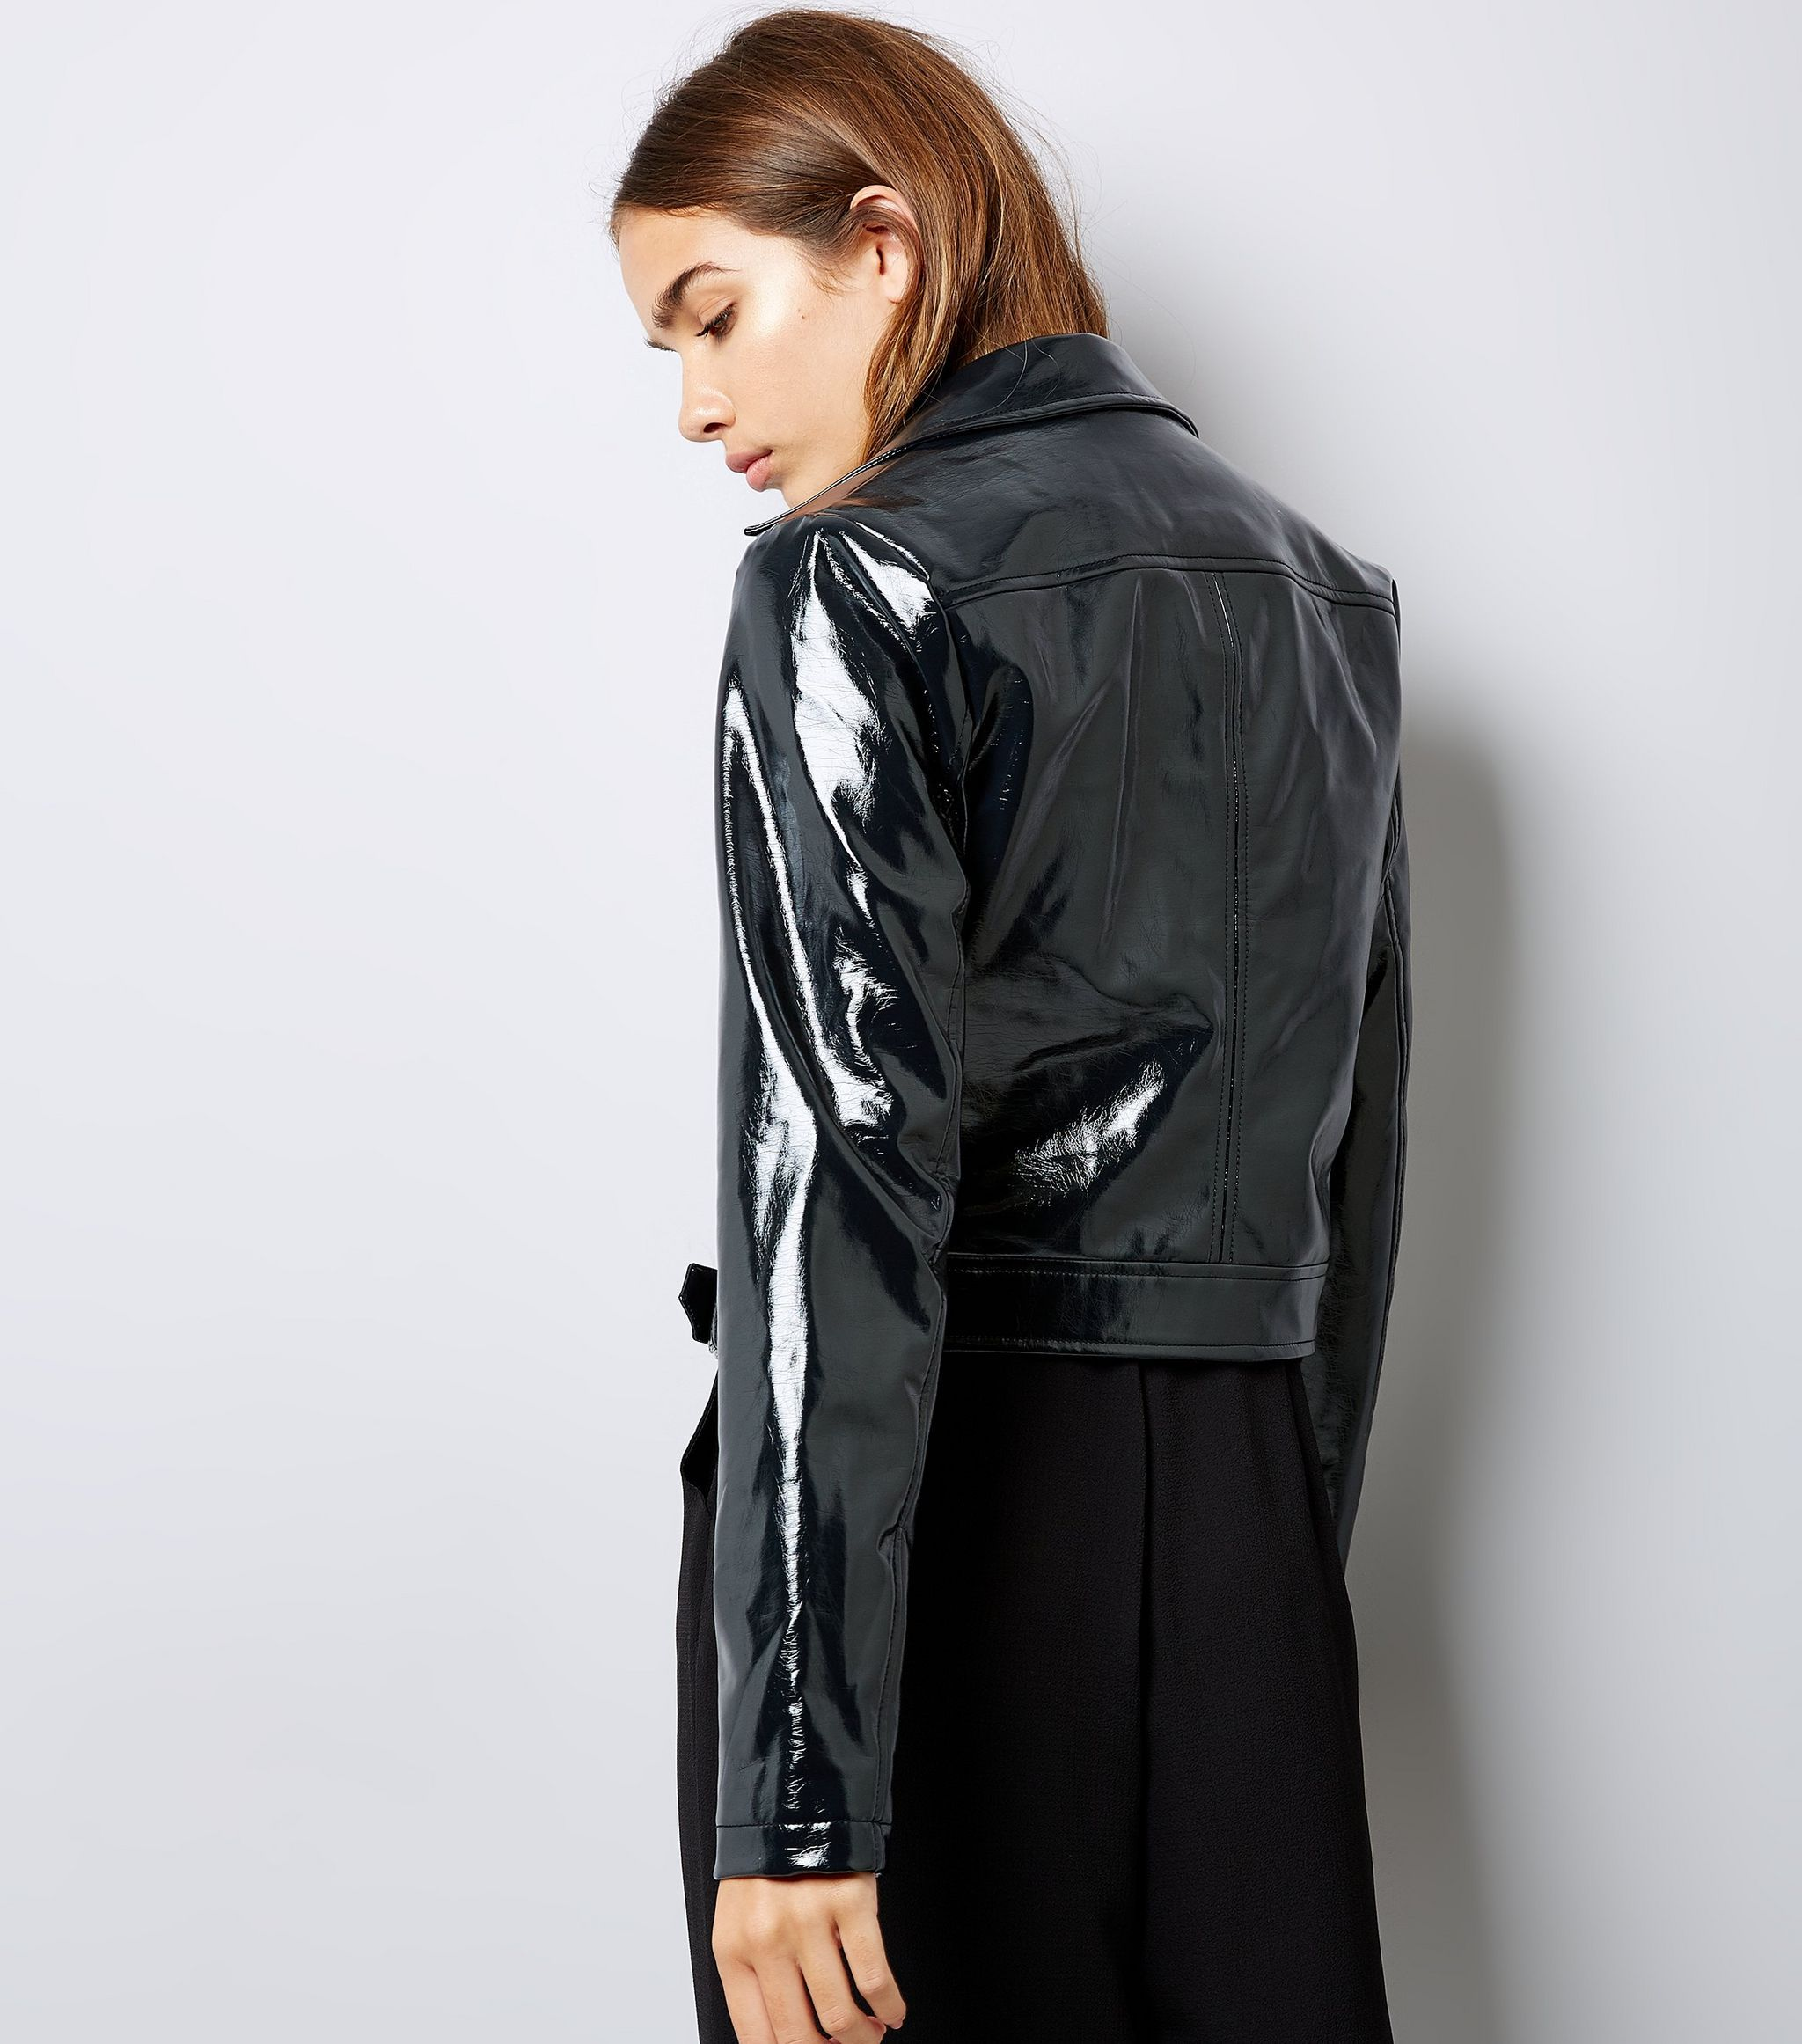 Black Patent Biker Jacket New Look Vinyl Clothing Pvc Outfits Fashion [ 2323 x 2048 Pixel ]